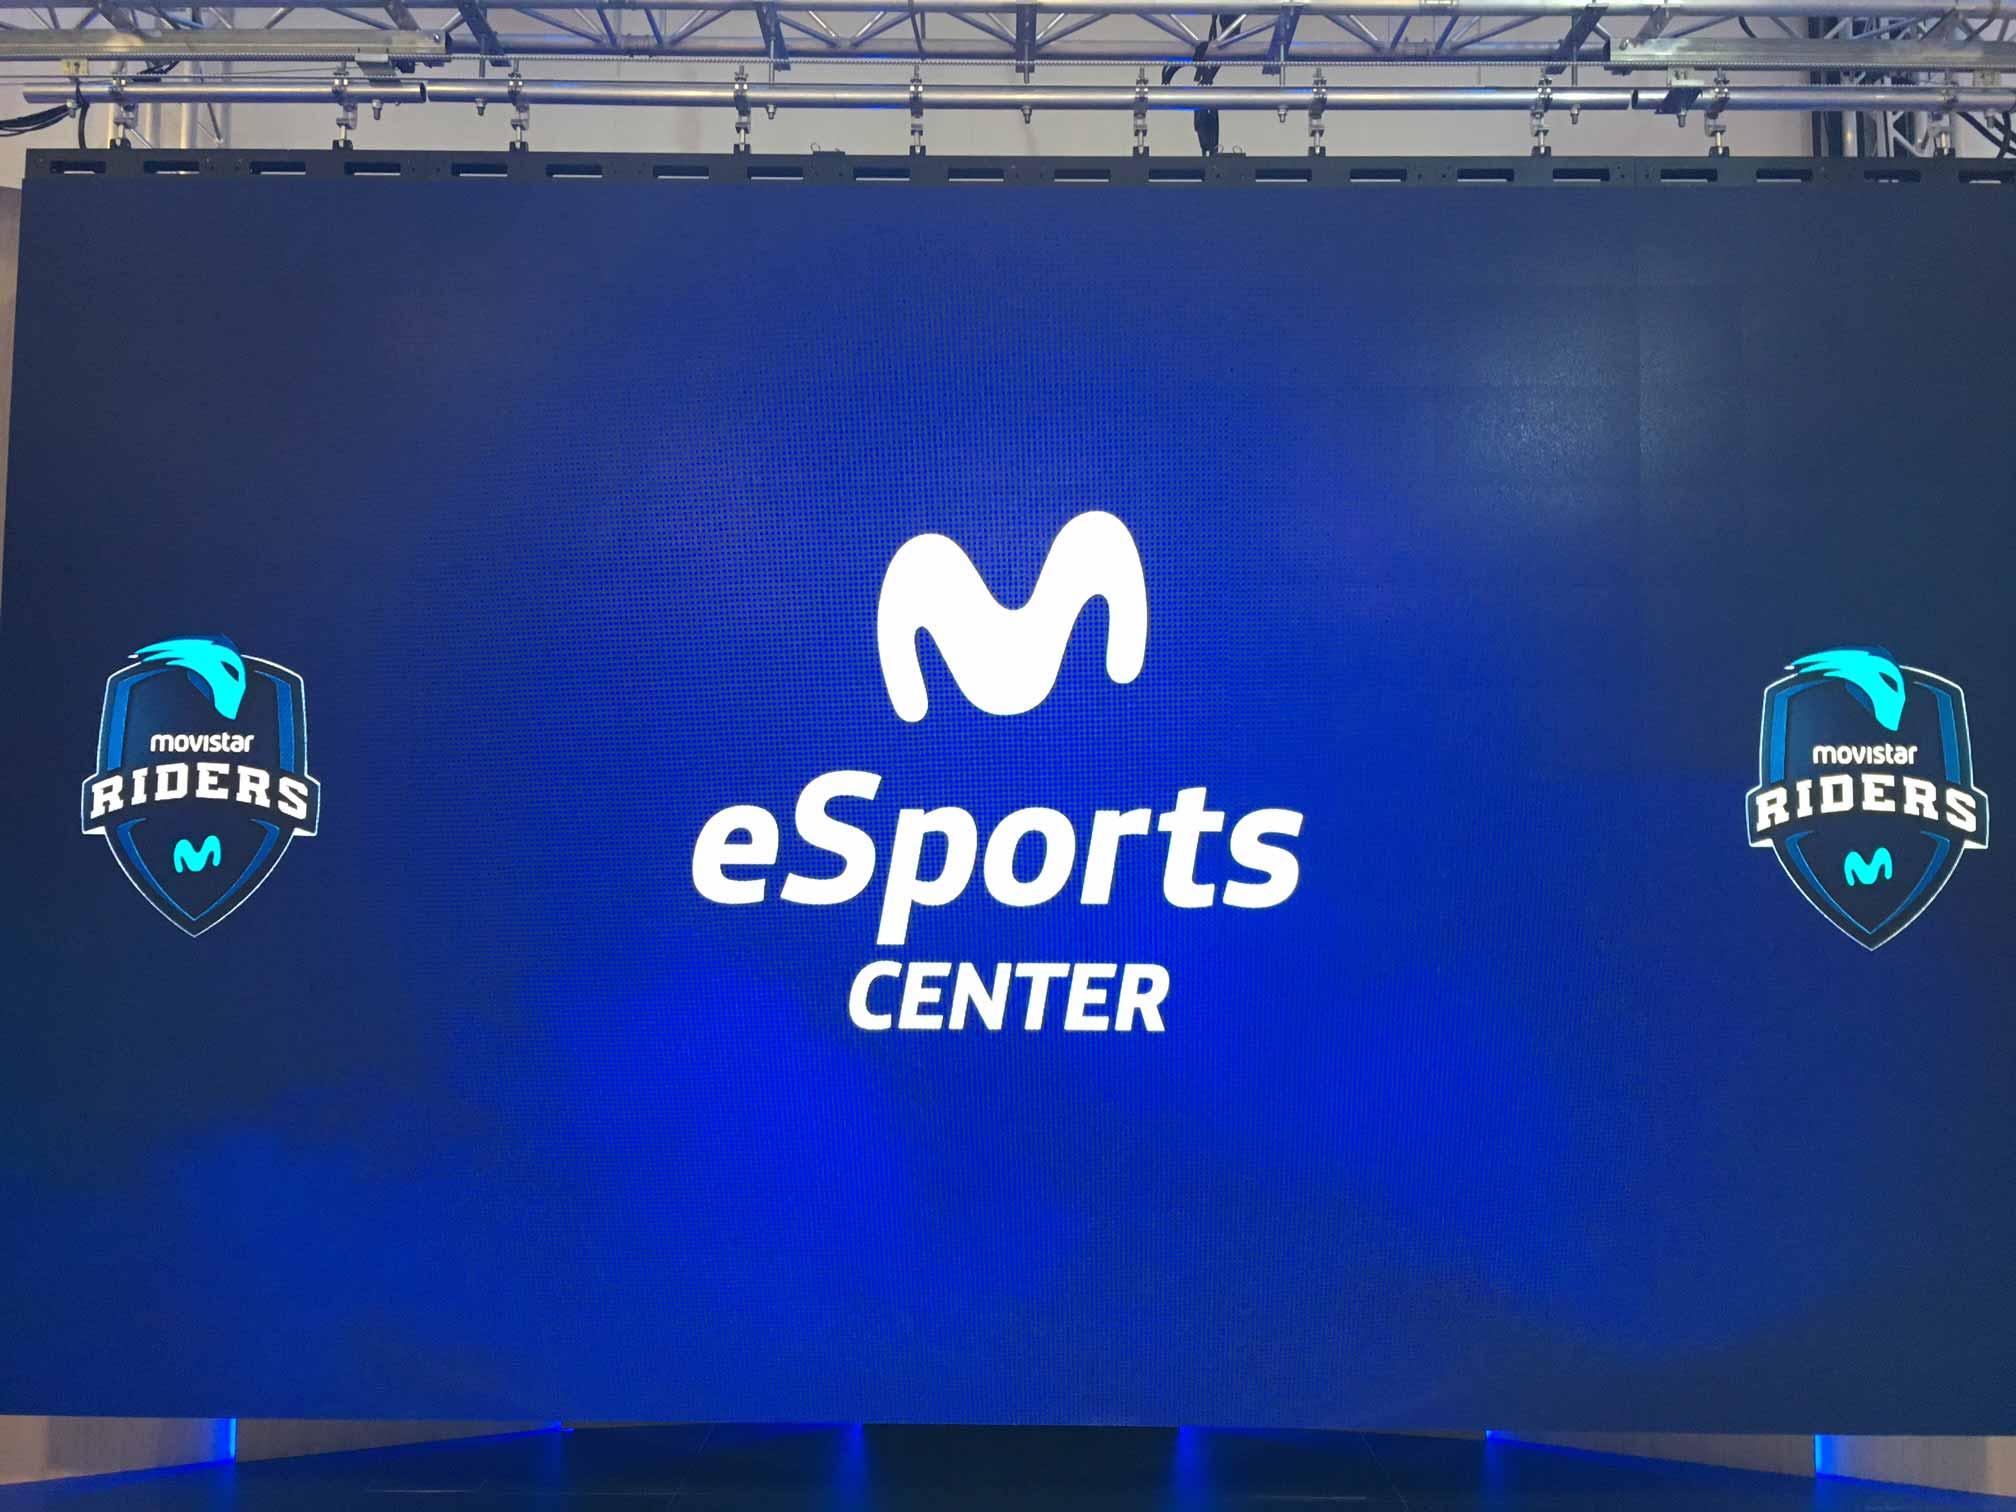 Movistar eSports Center